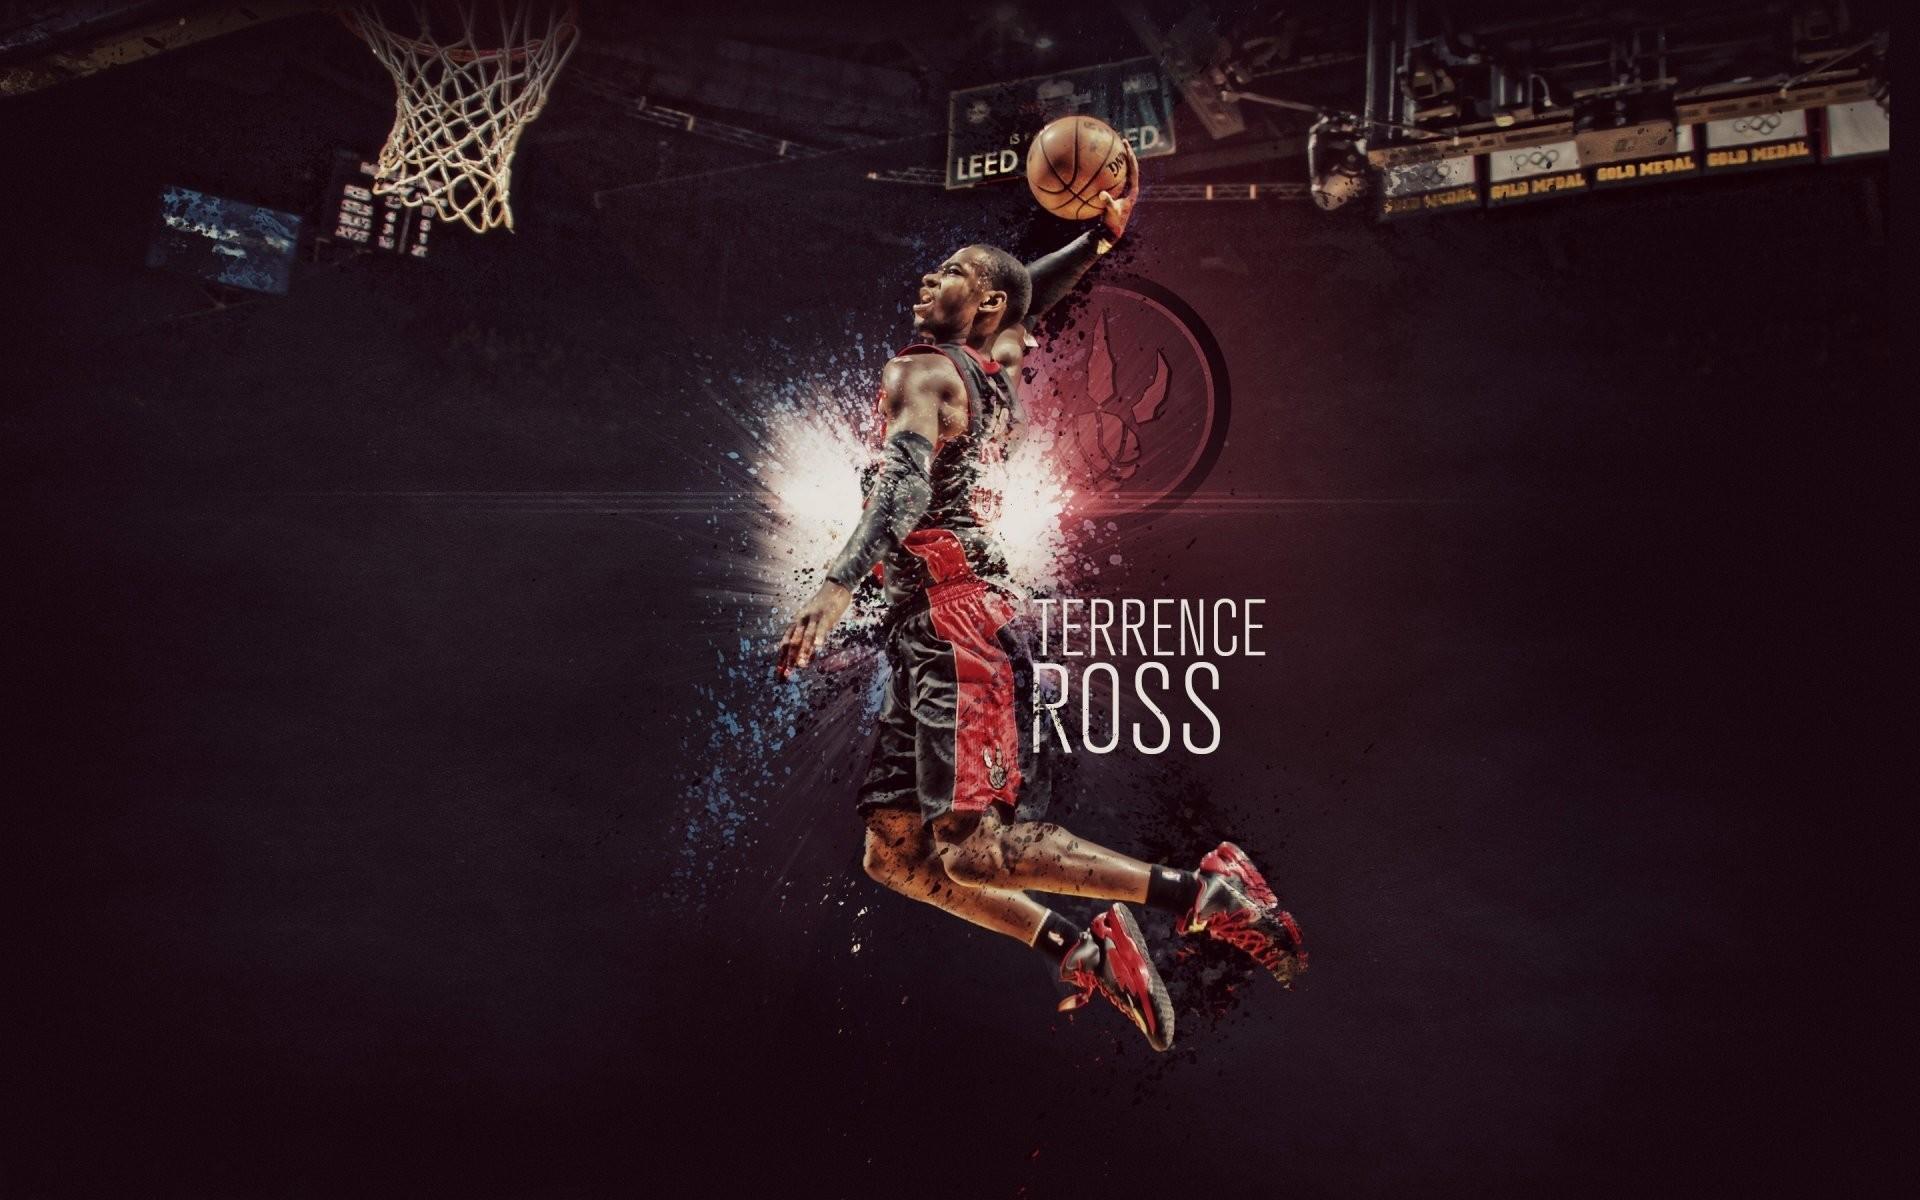 terrence ross terrence ross toronto raptors toronto raptors slam dunk hang  nba basketball